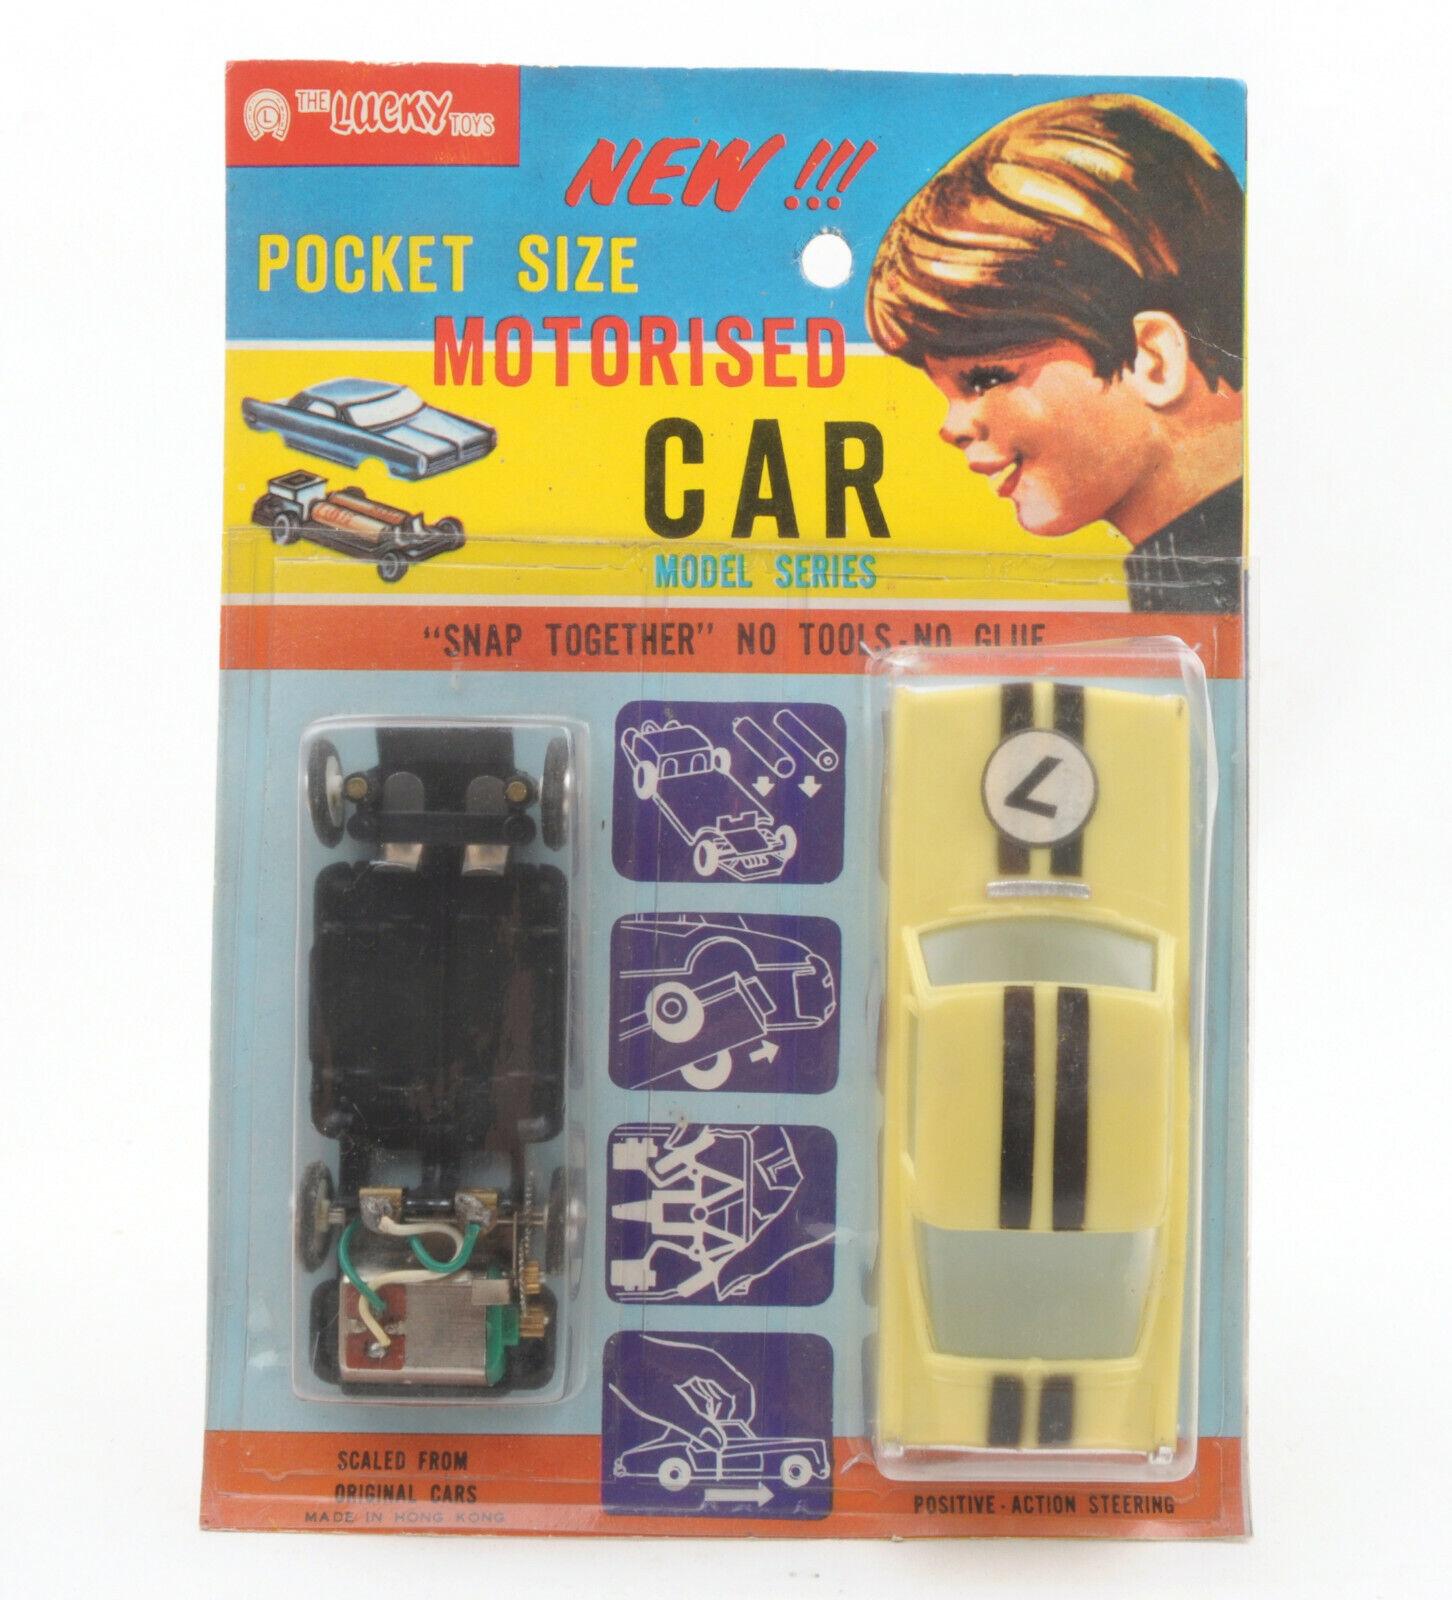 Vintage Lucky Toys Toys Hong Kong Plastic Pocket Sized Motorised Car  MOC